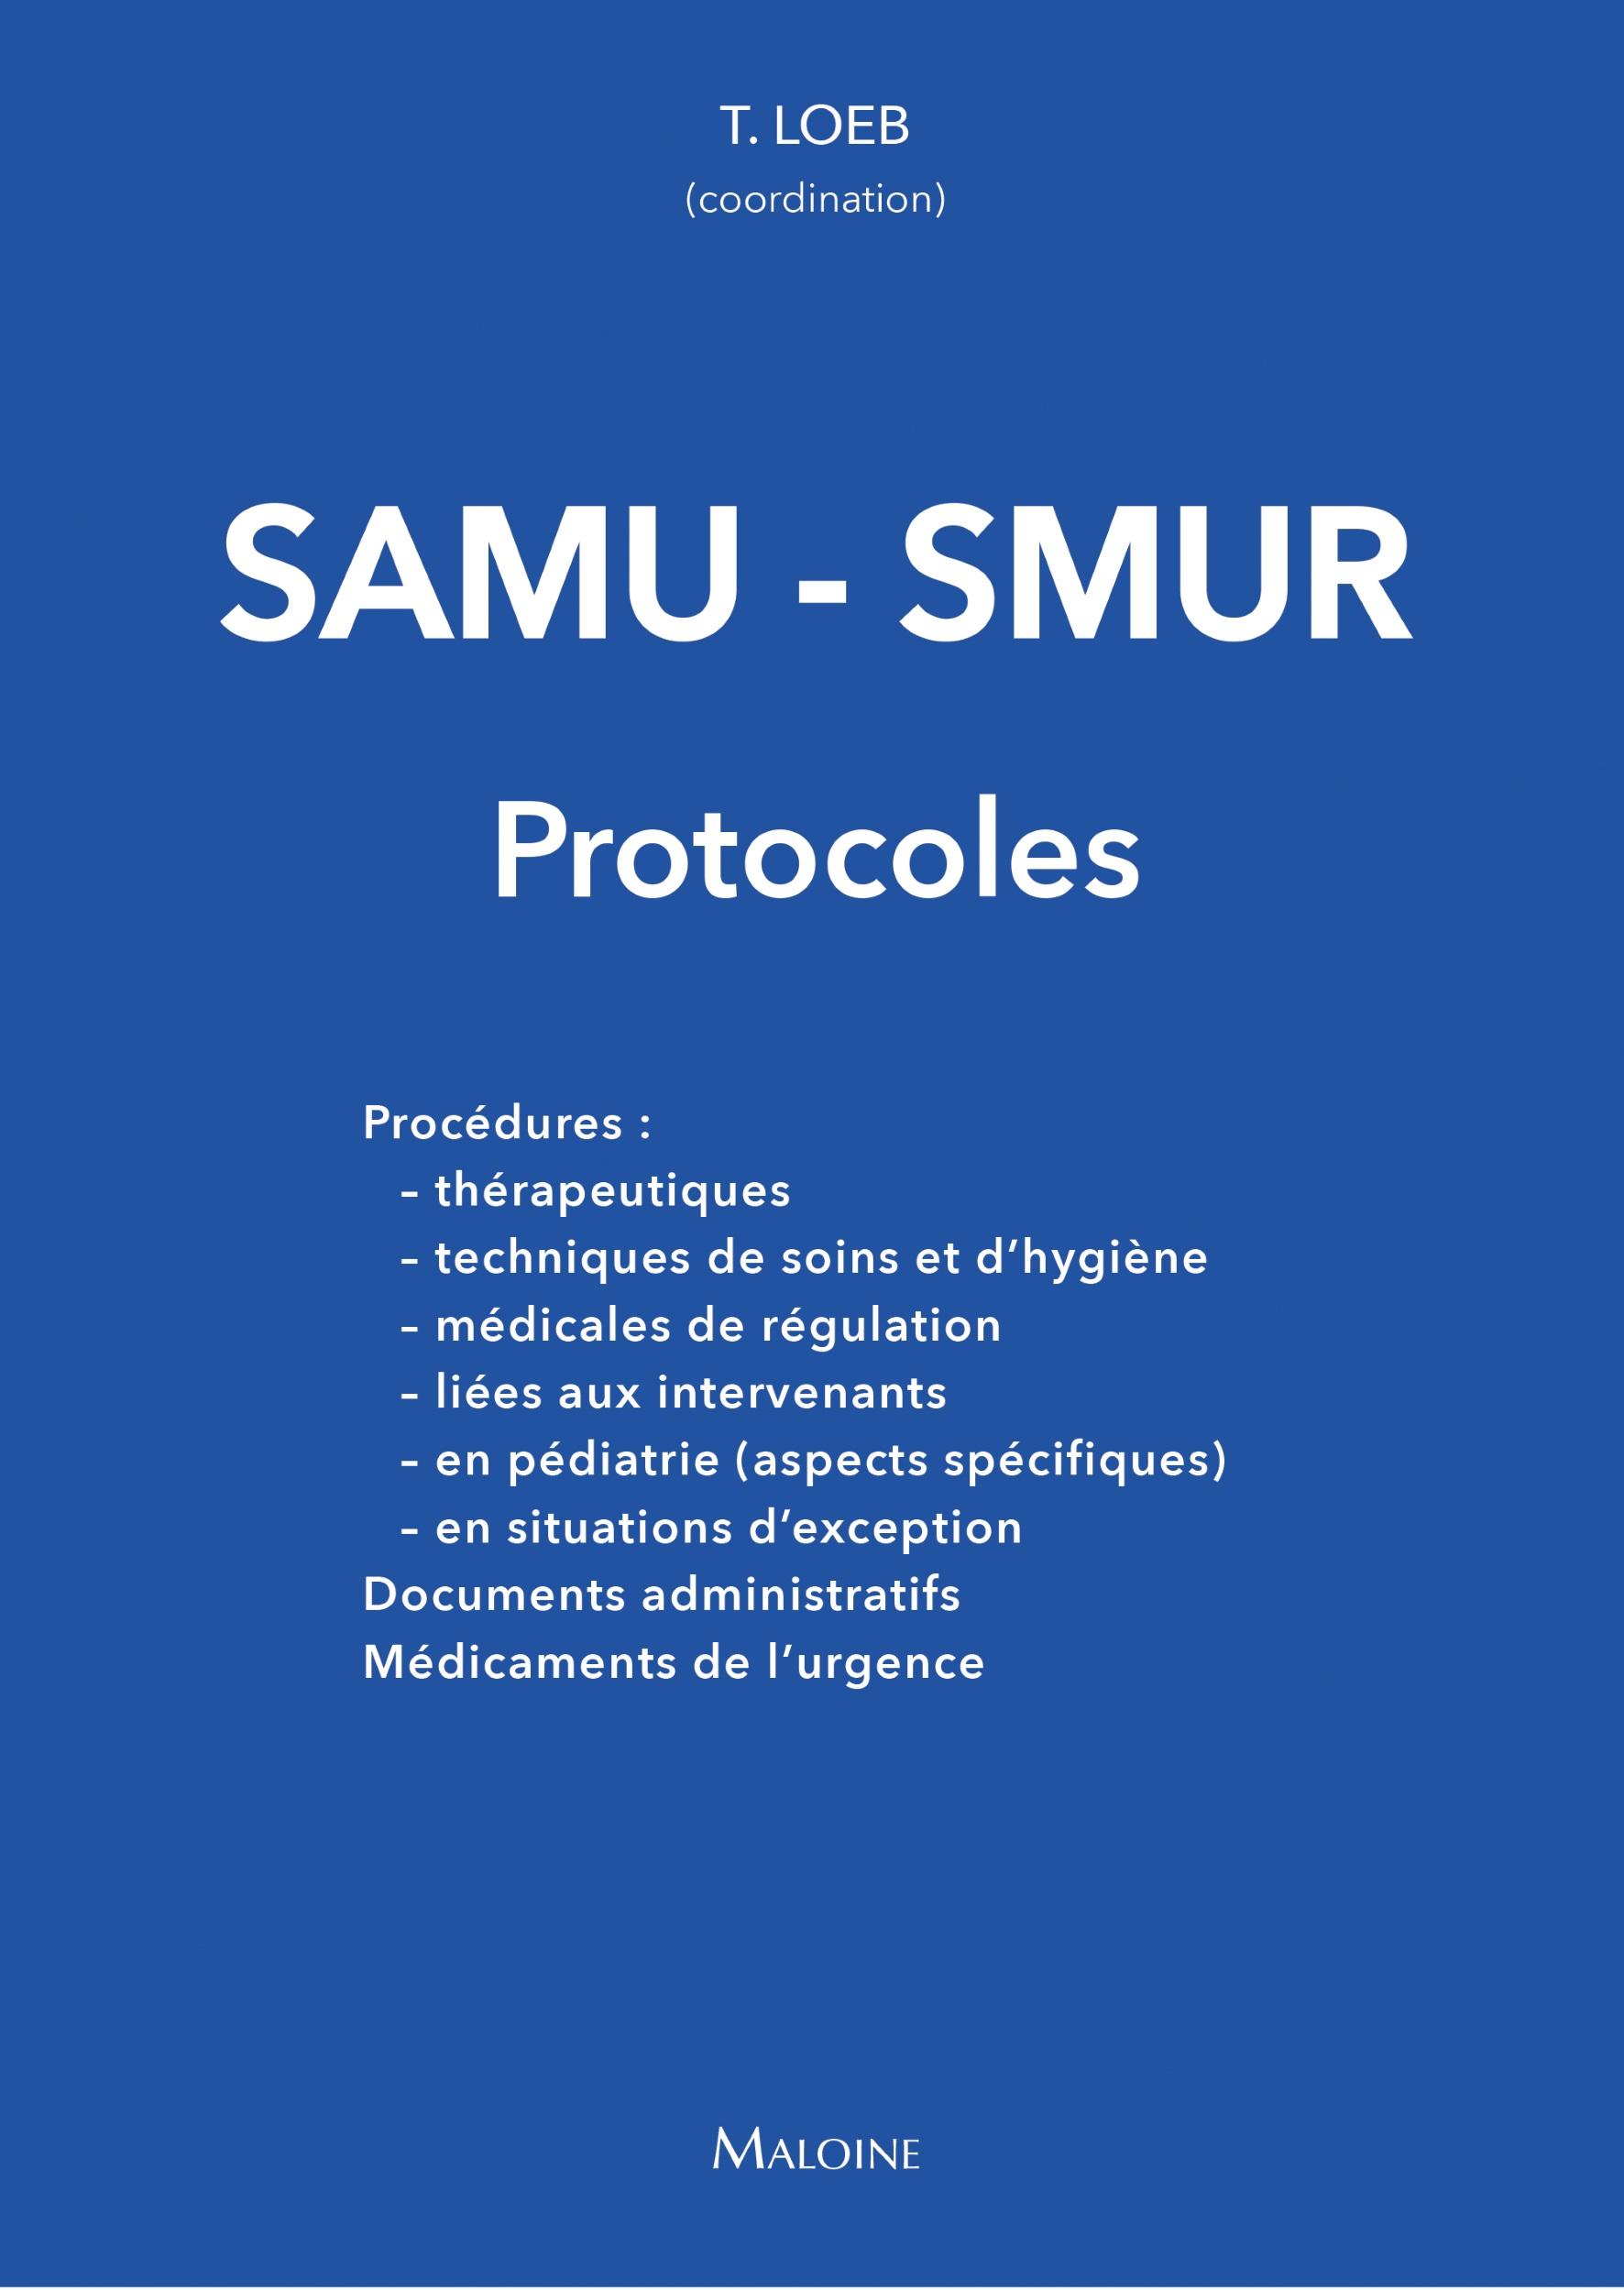 SAMU-SMUR – Les protocoles